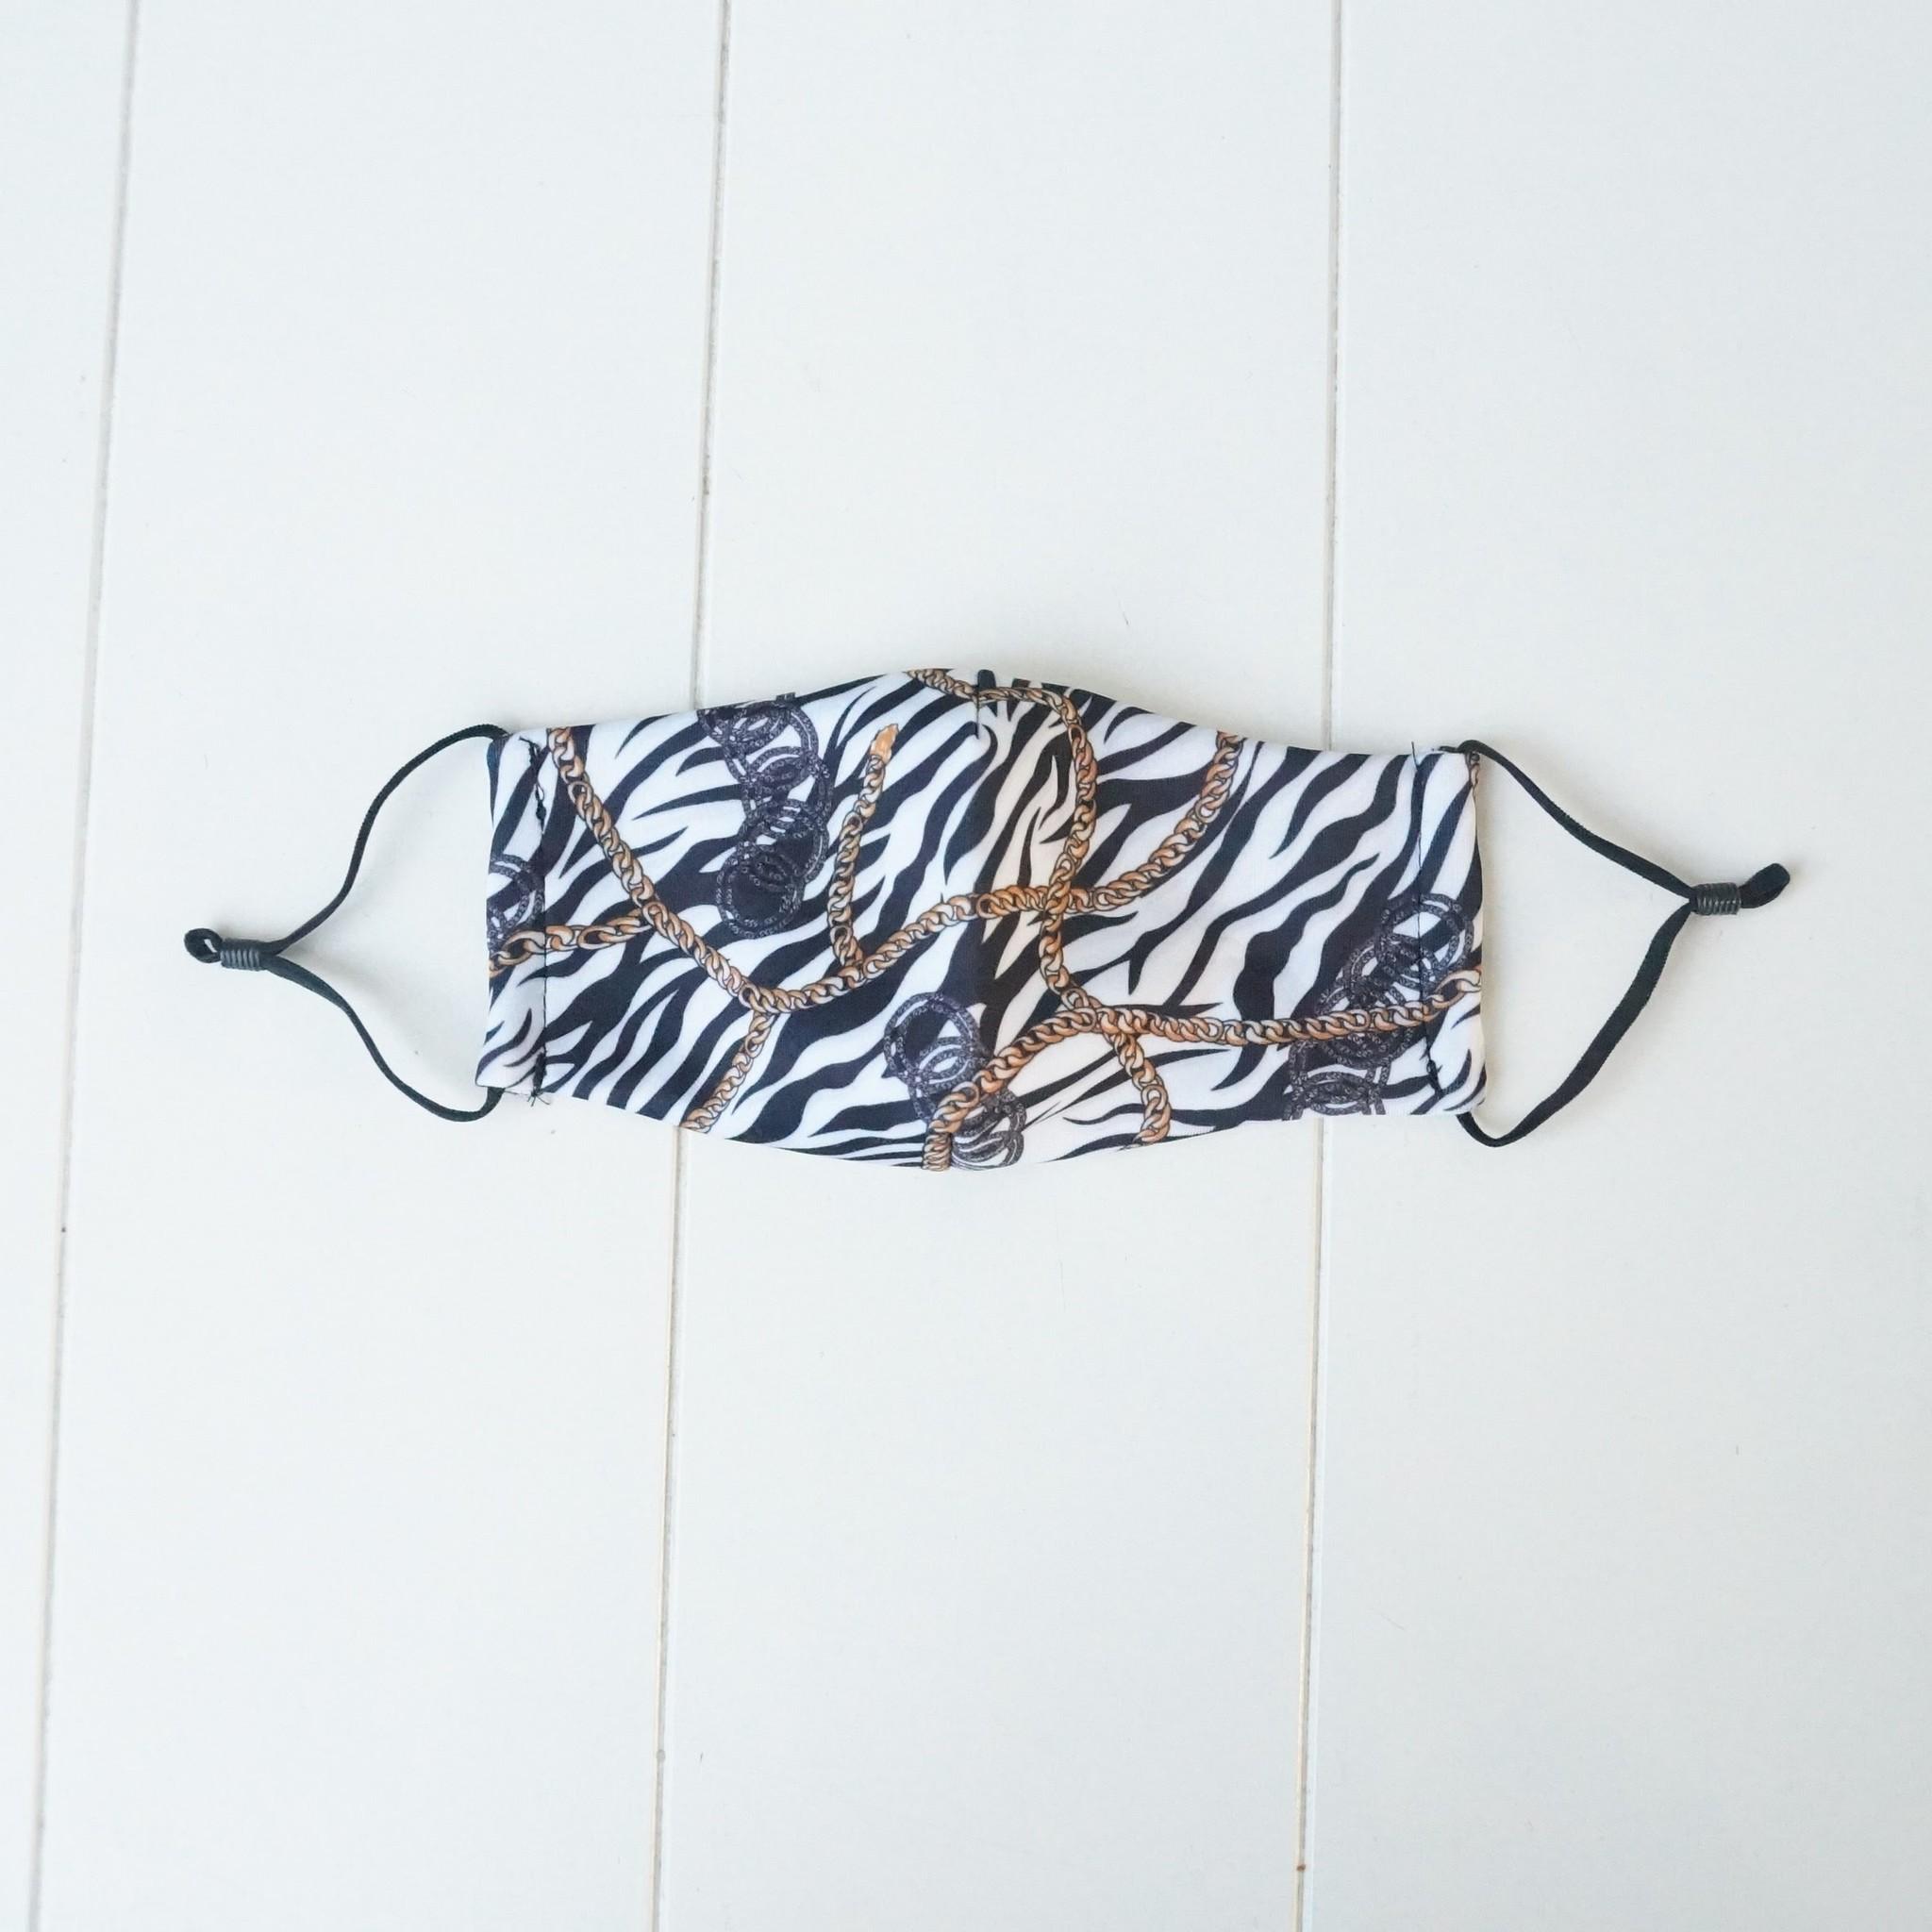 Wit mondkapje met zebraprint